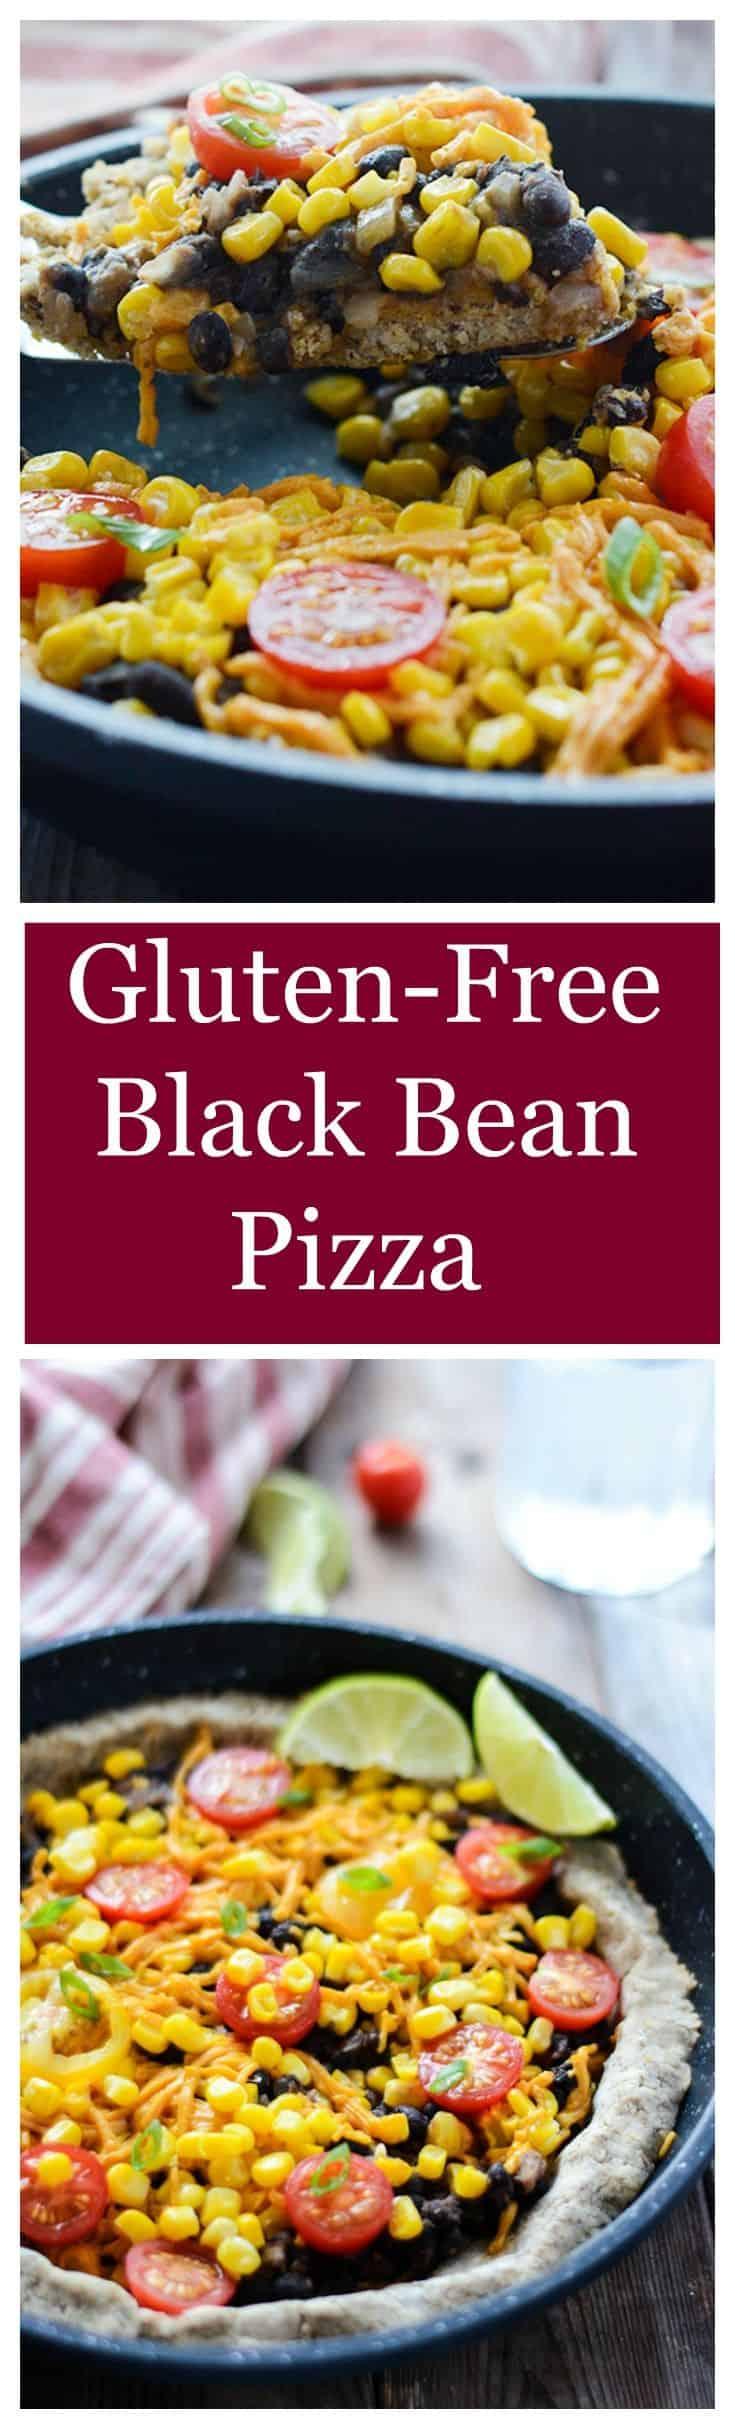 Gluten-Free Black Bean Pizza